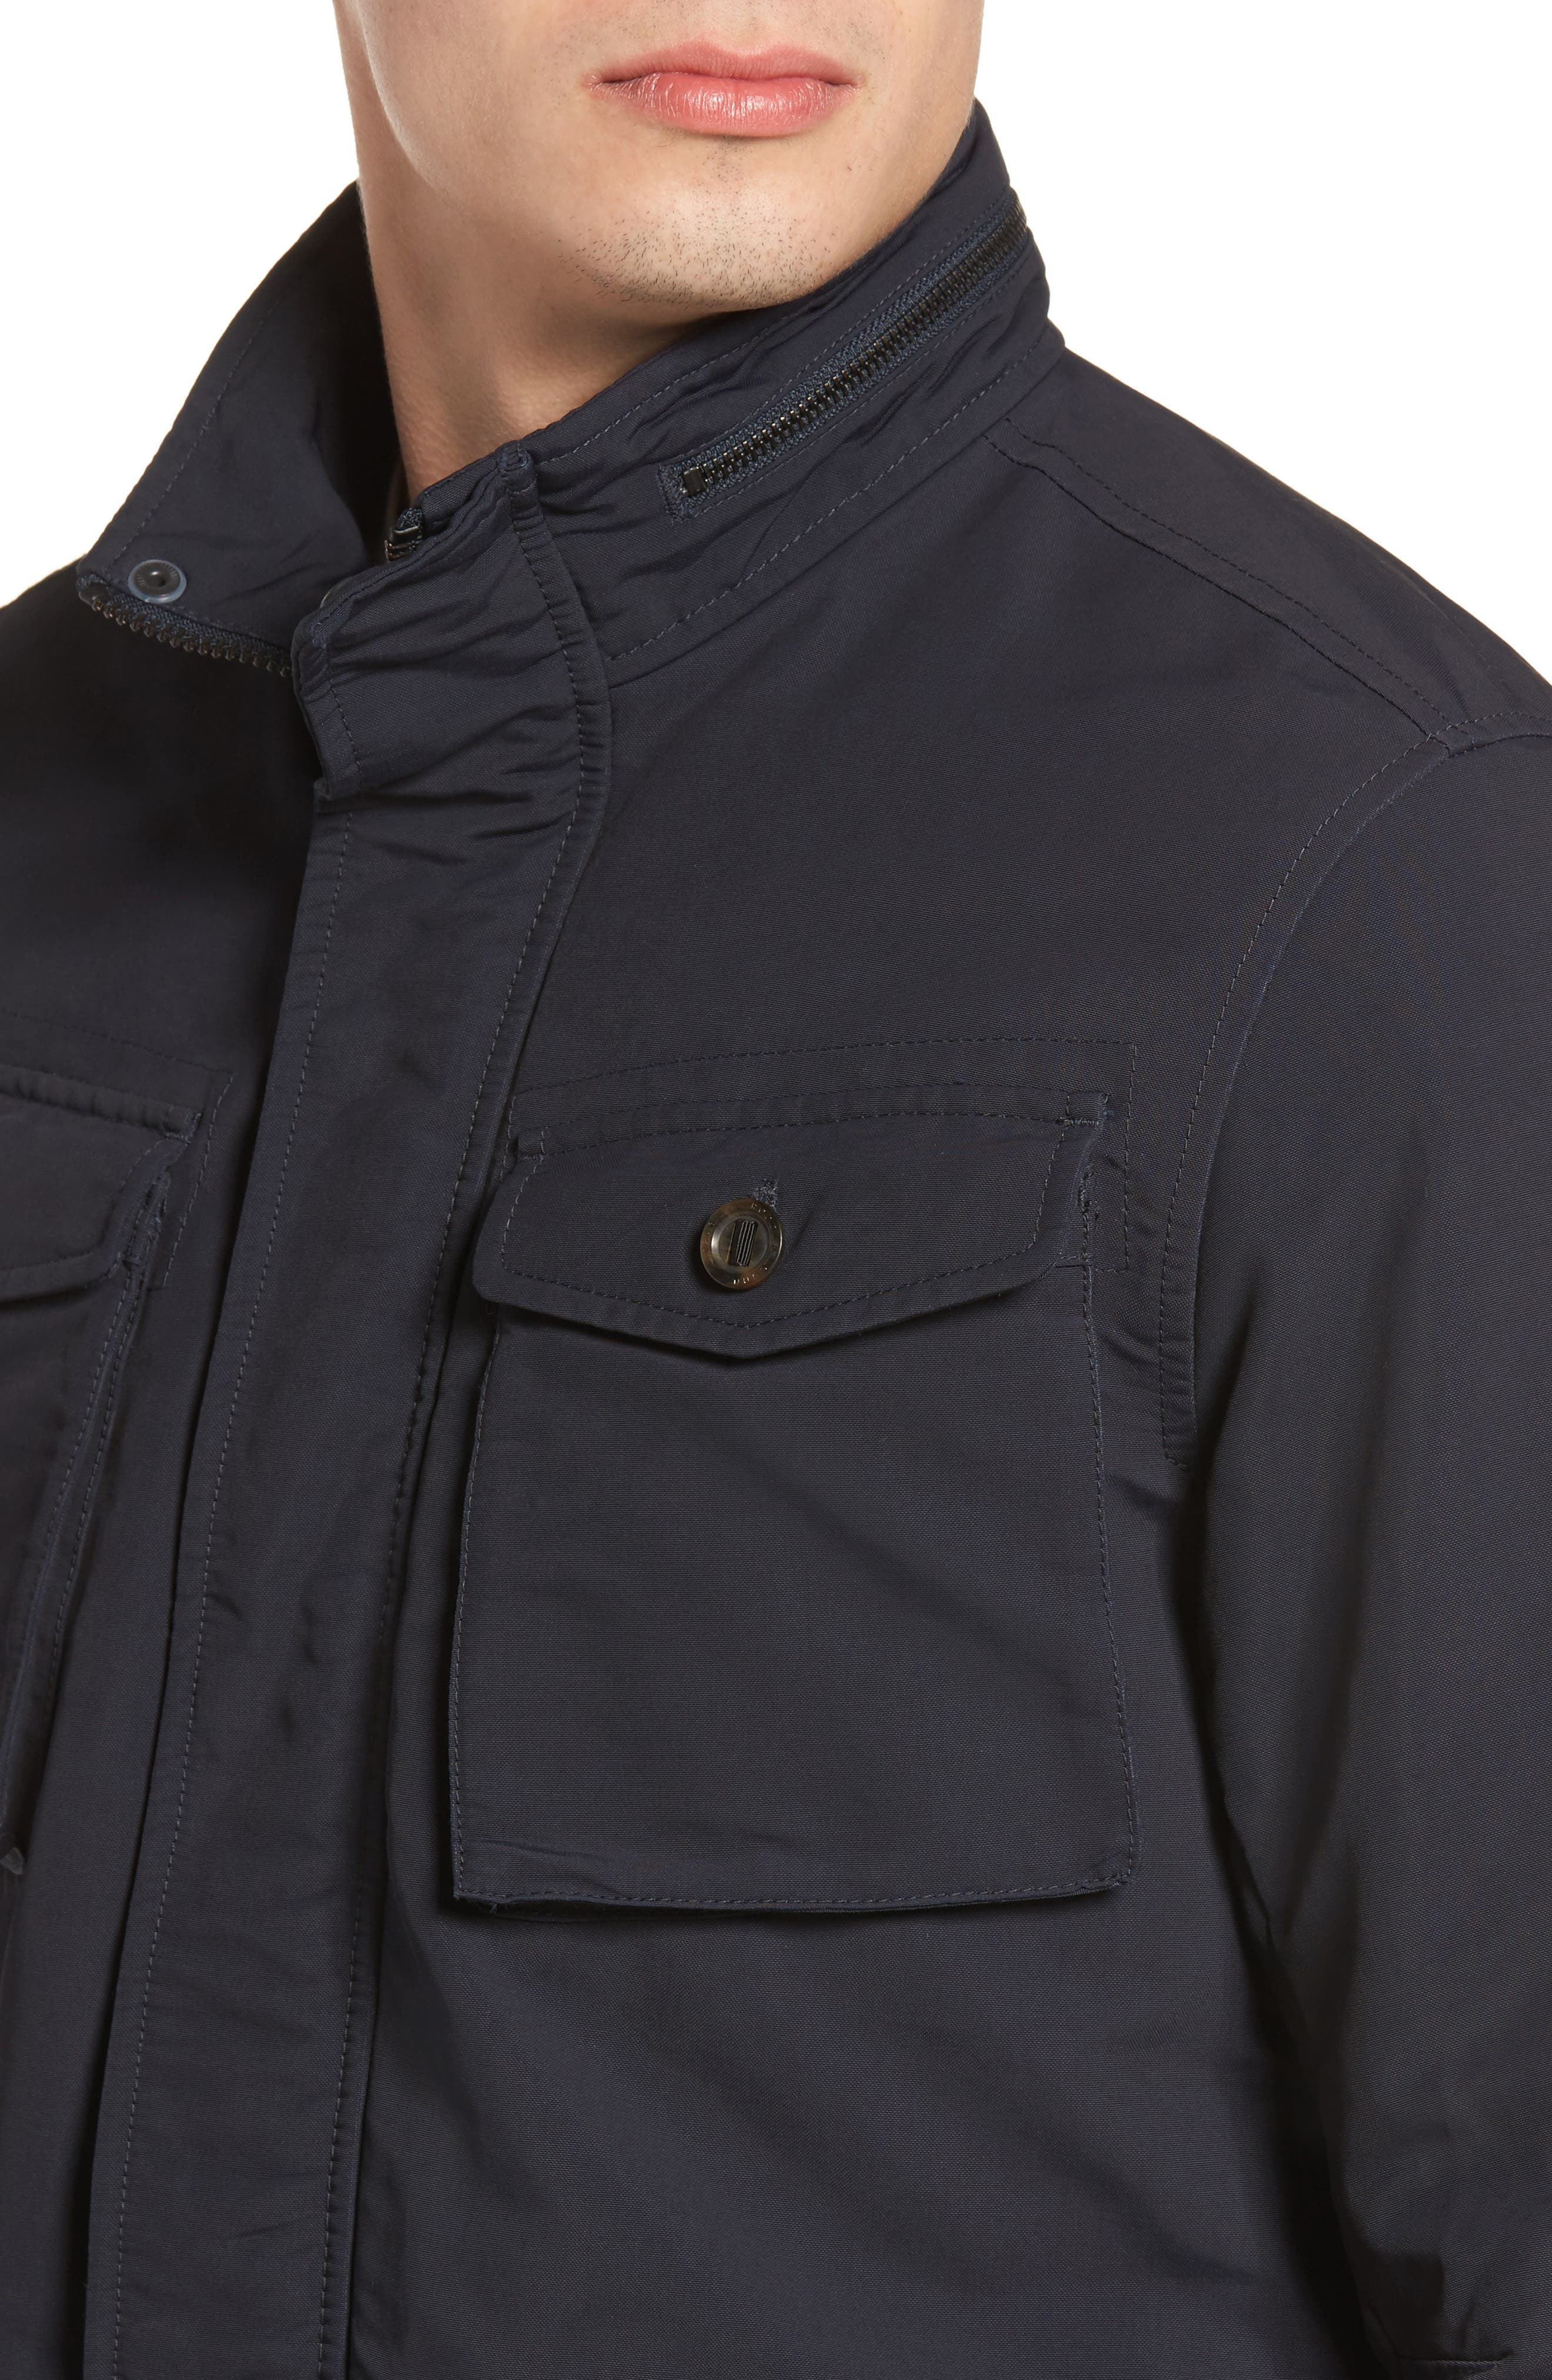 Bendigo Utility Jacket,                             Alternate thumbnail 4, color,                             ECLIPSE